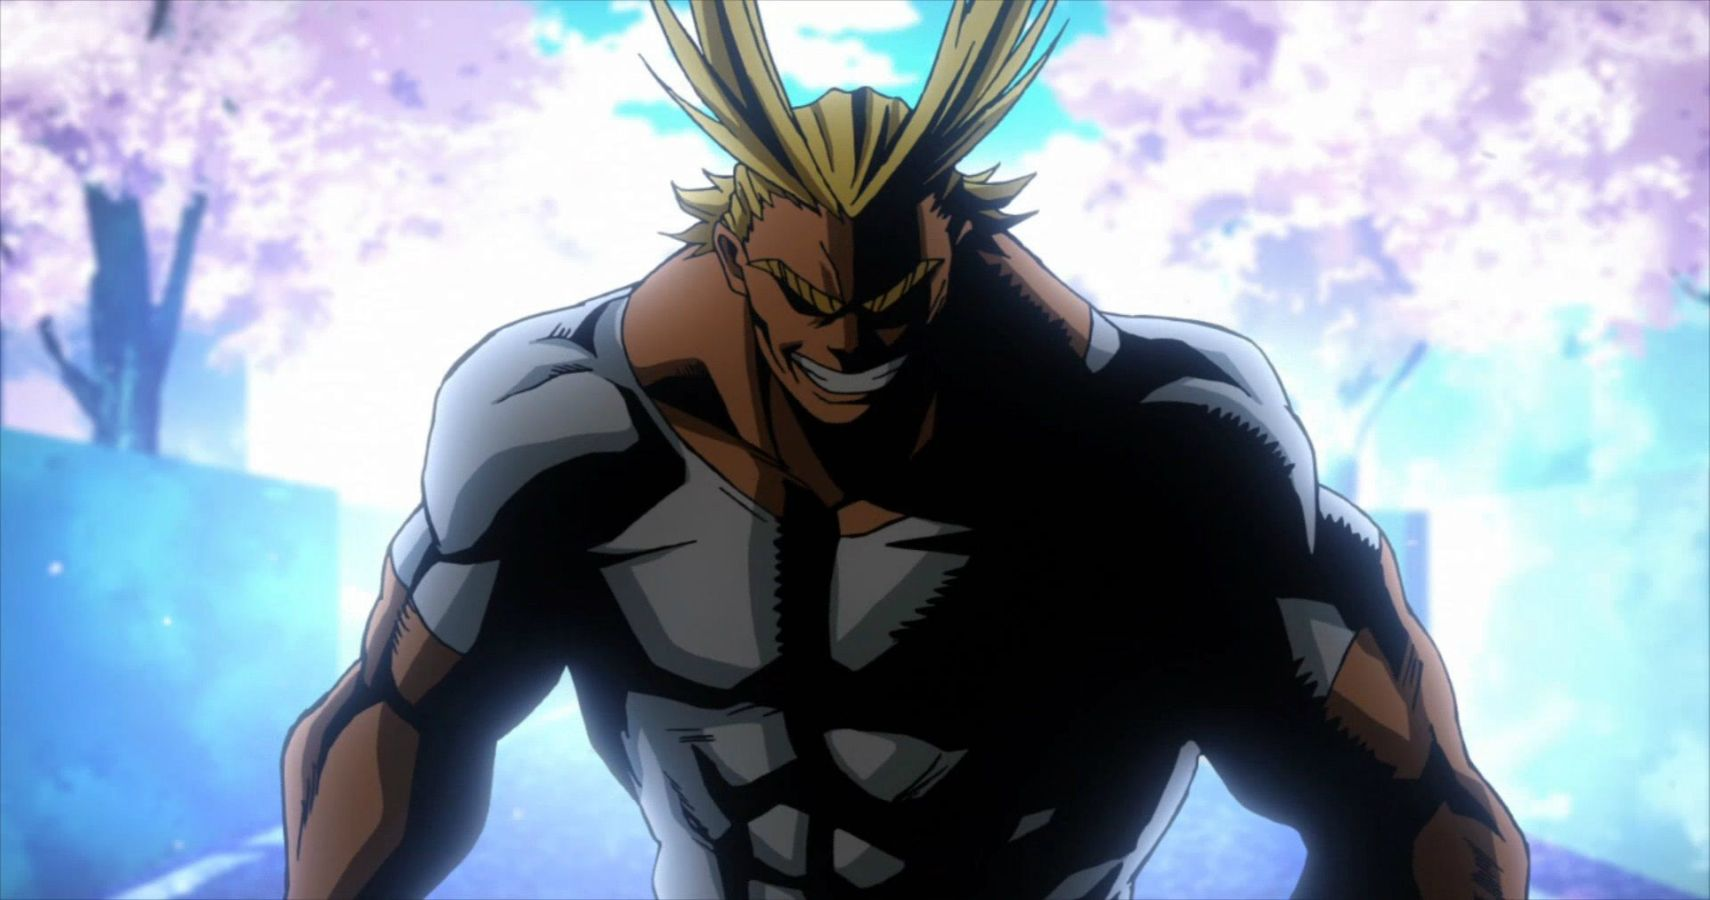 Strongest Characters in My Hero Academia